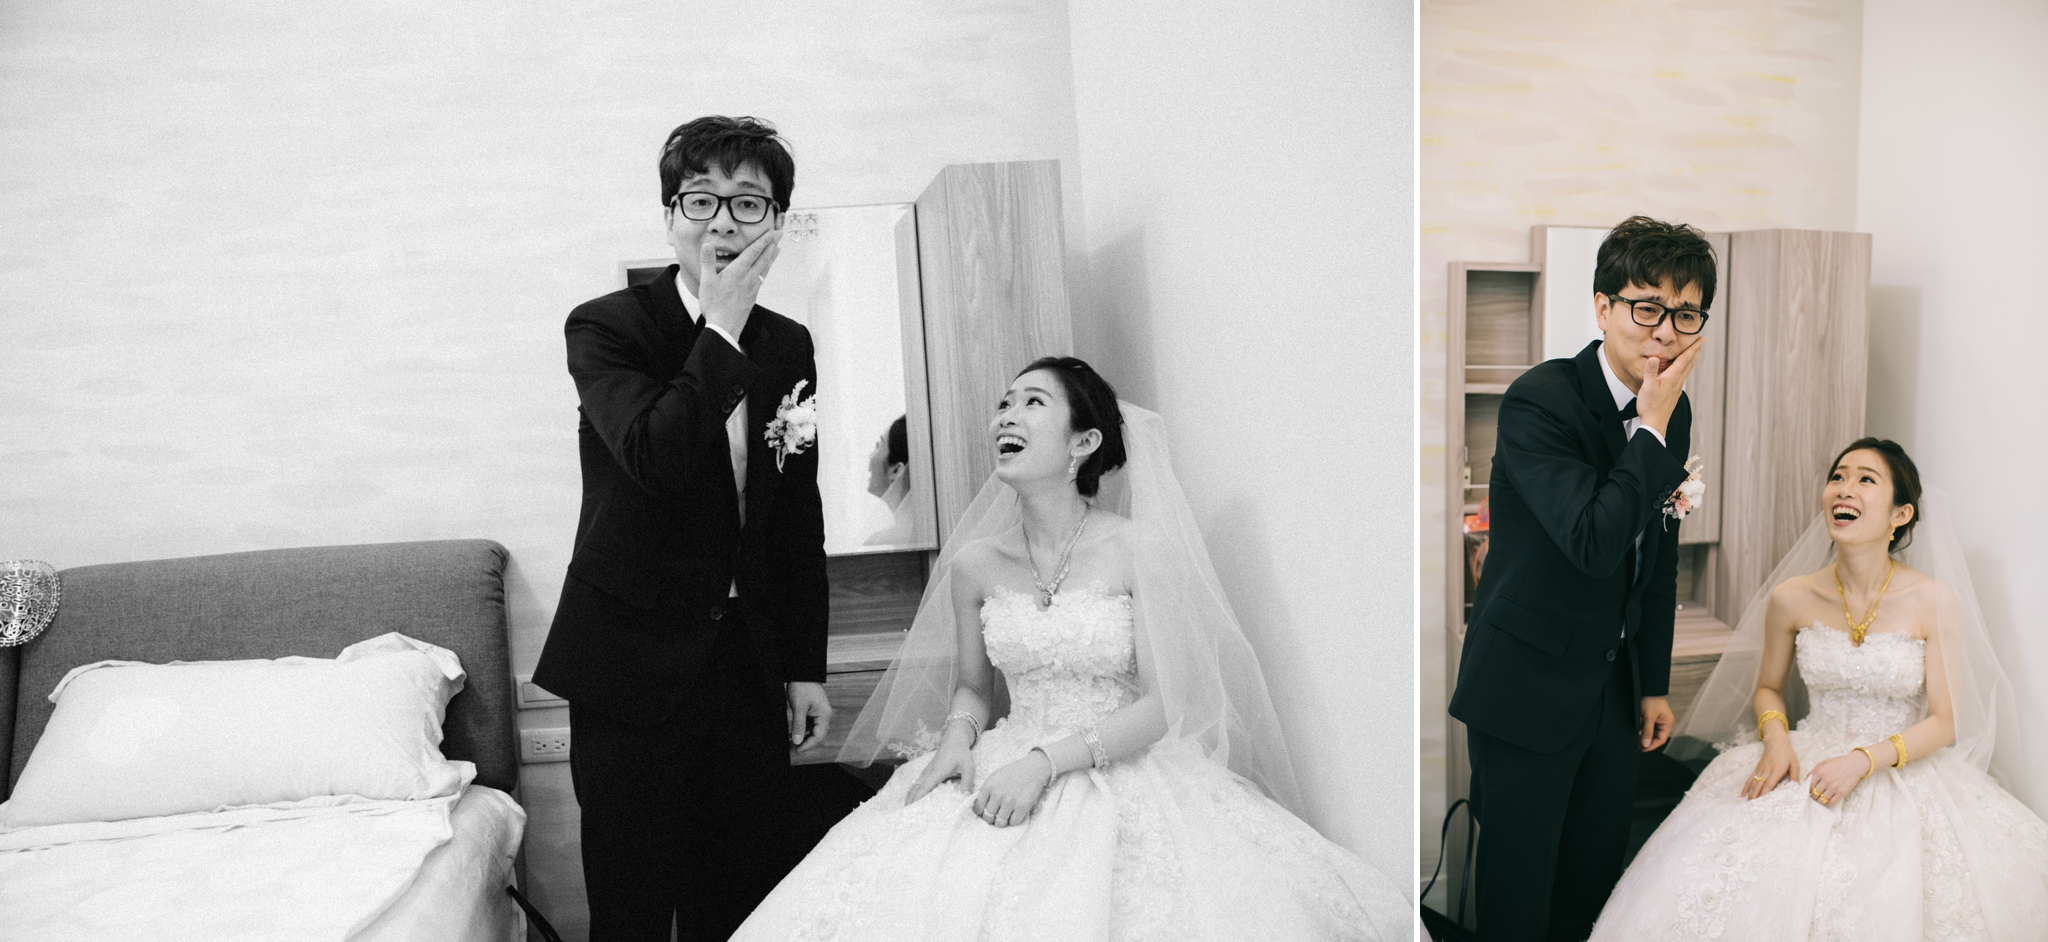 Tina+Nash-wedding-台北婚禮迎娶晚宴-新莊終身大事-095.jpg